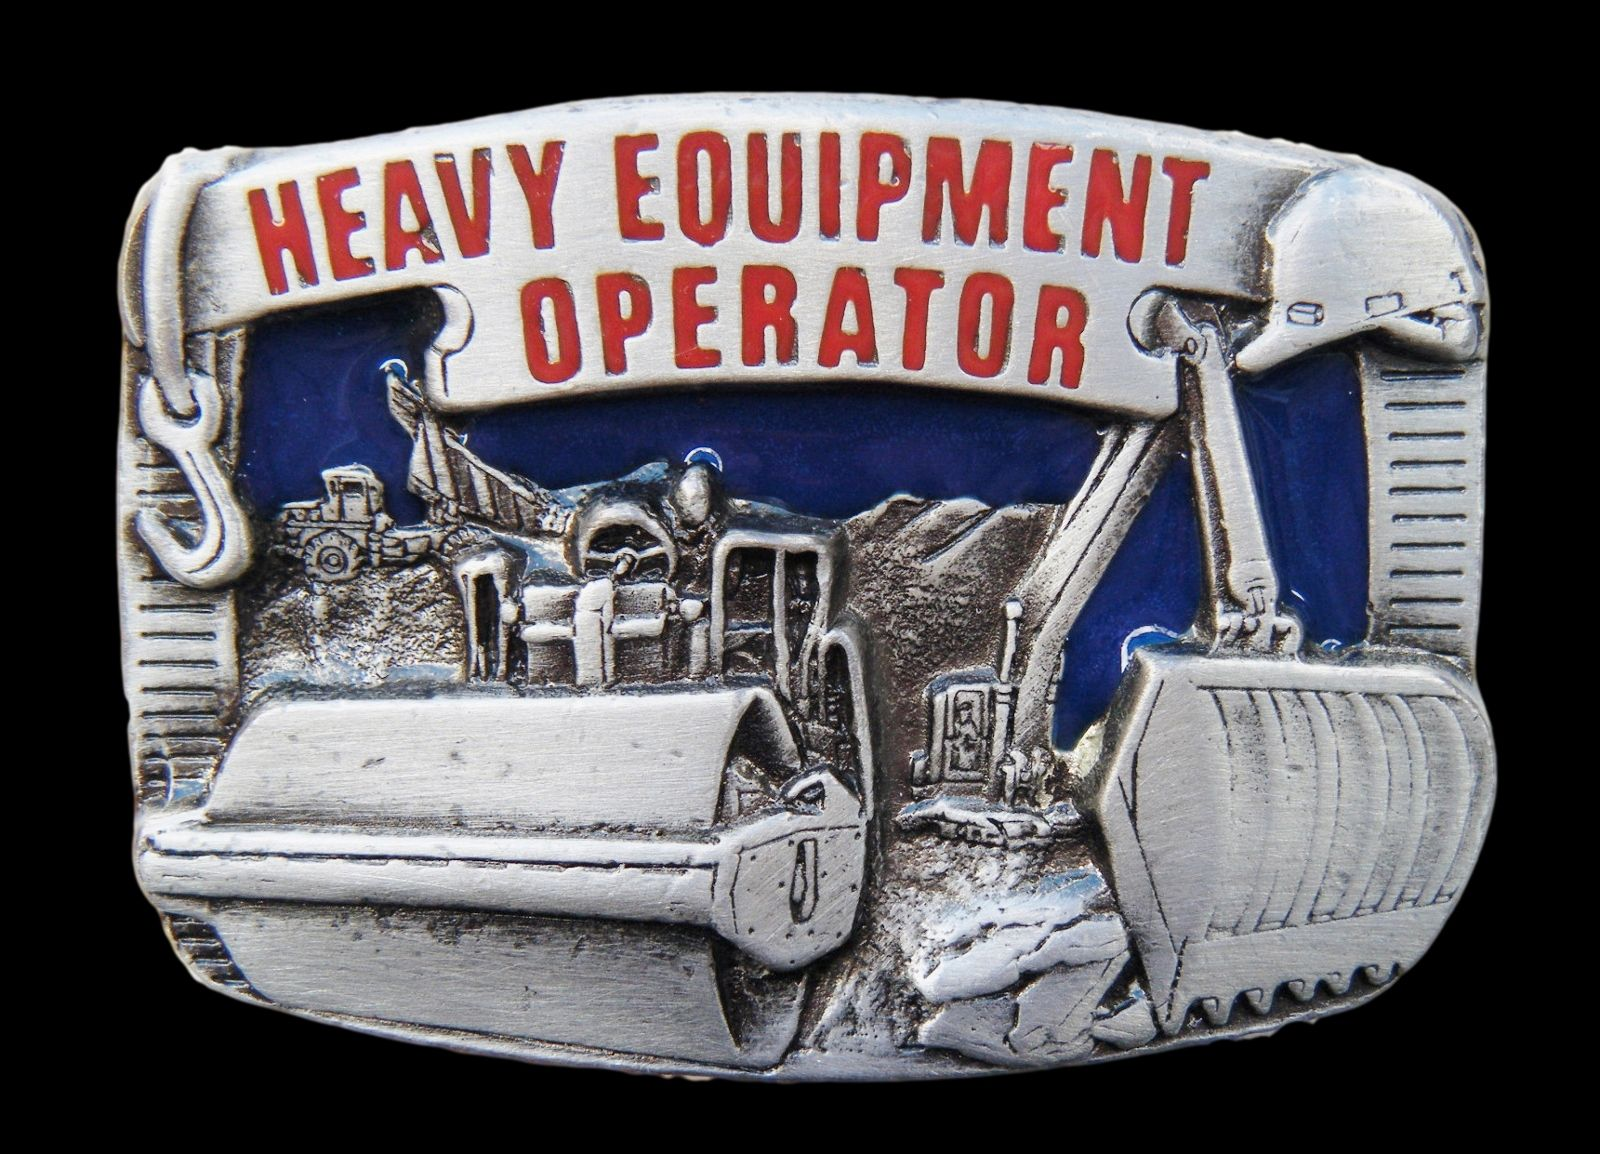 CATERPILLAR HEAVY EQUIPMENT TOOL OPERATOR BELT BUCKLE